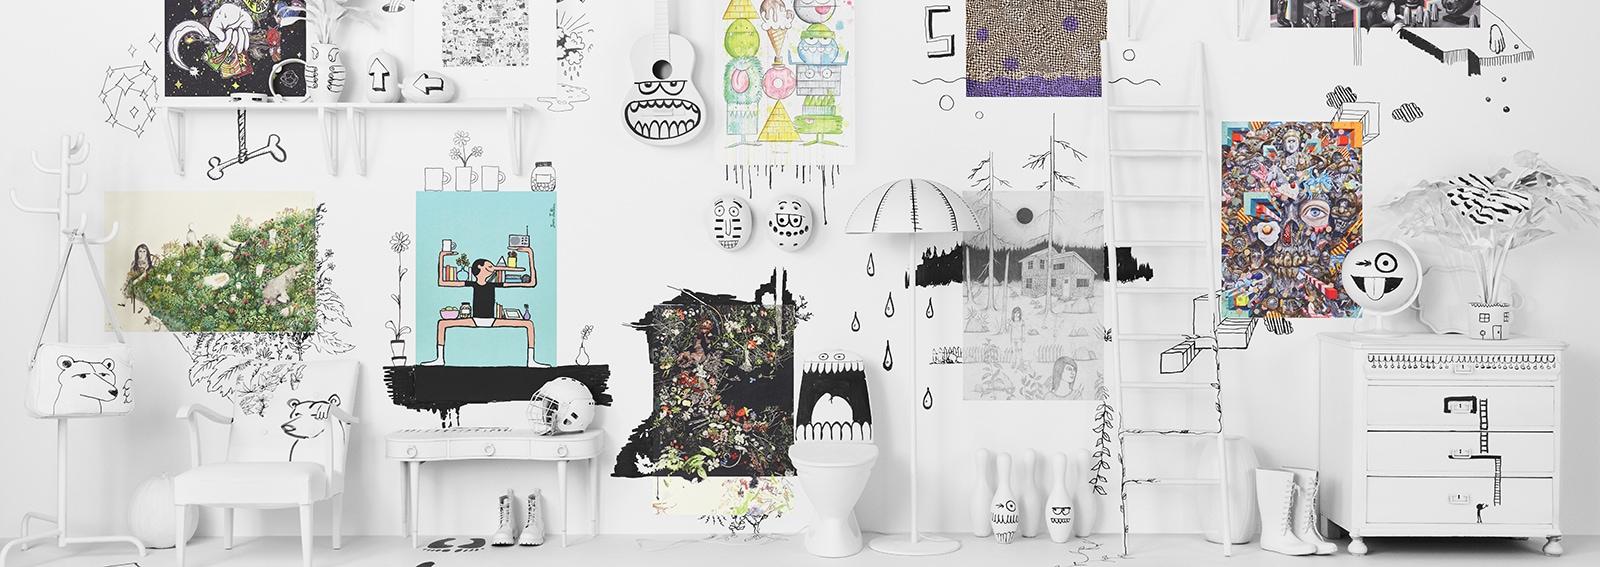 cover-ikea-art-event-2017-desktop